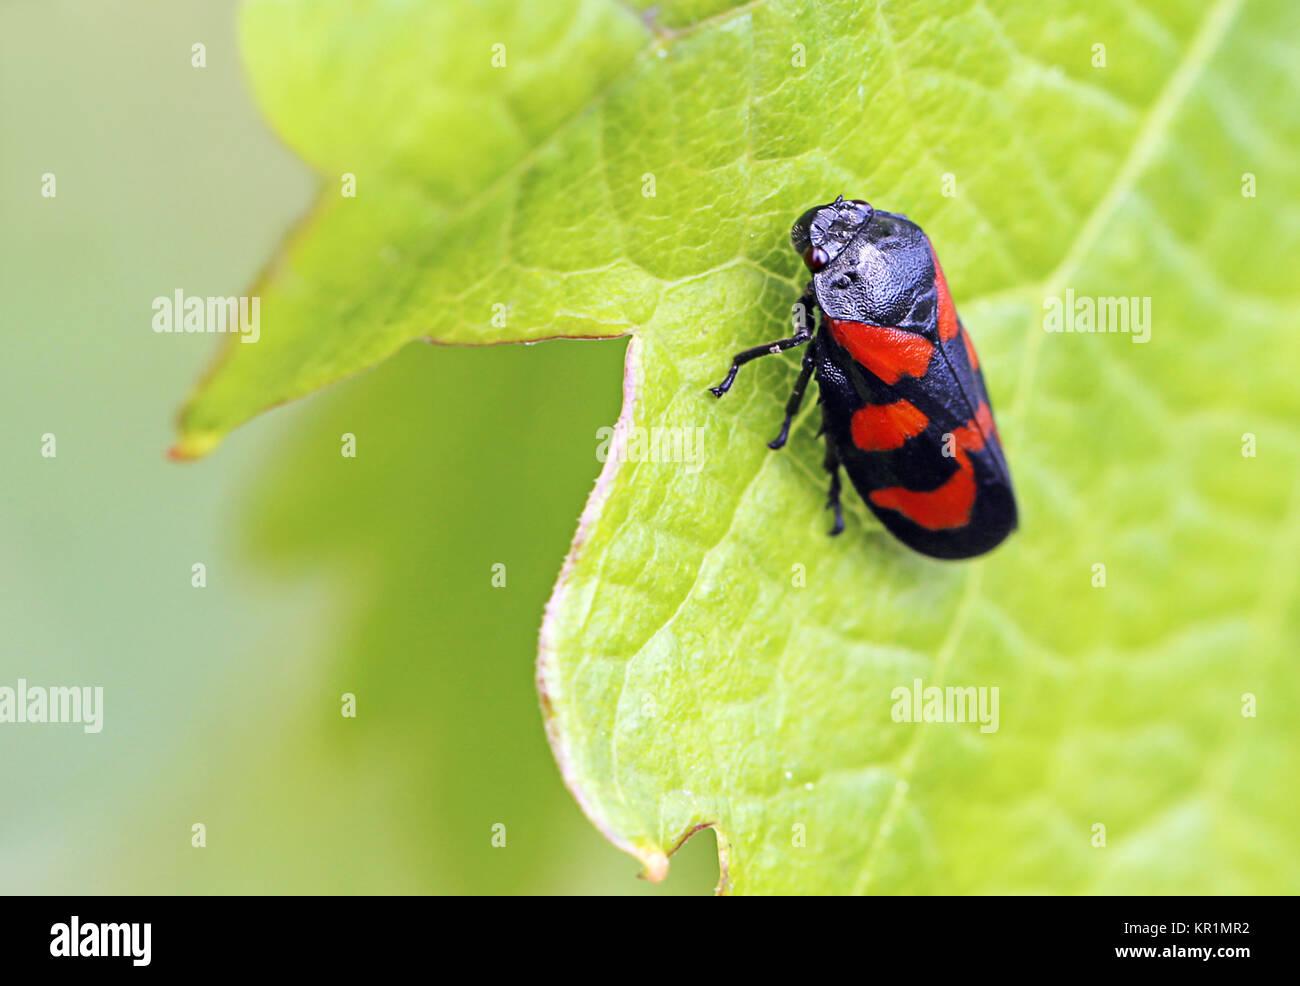 froghopper cercopis vulnerata on grape leaf Stock Photo